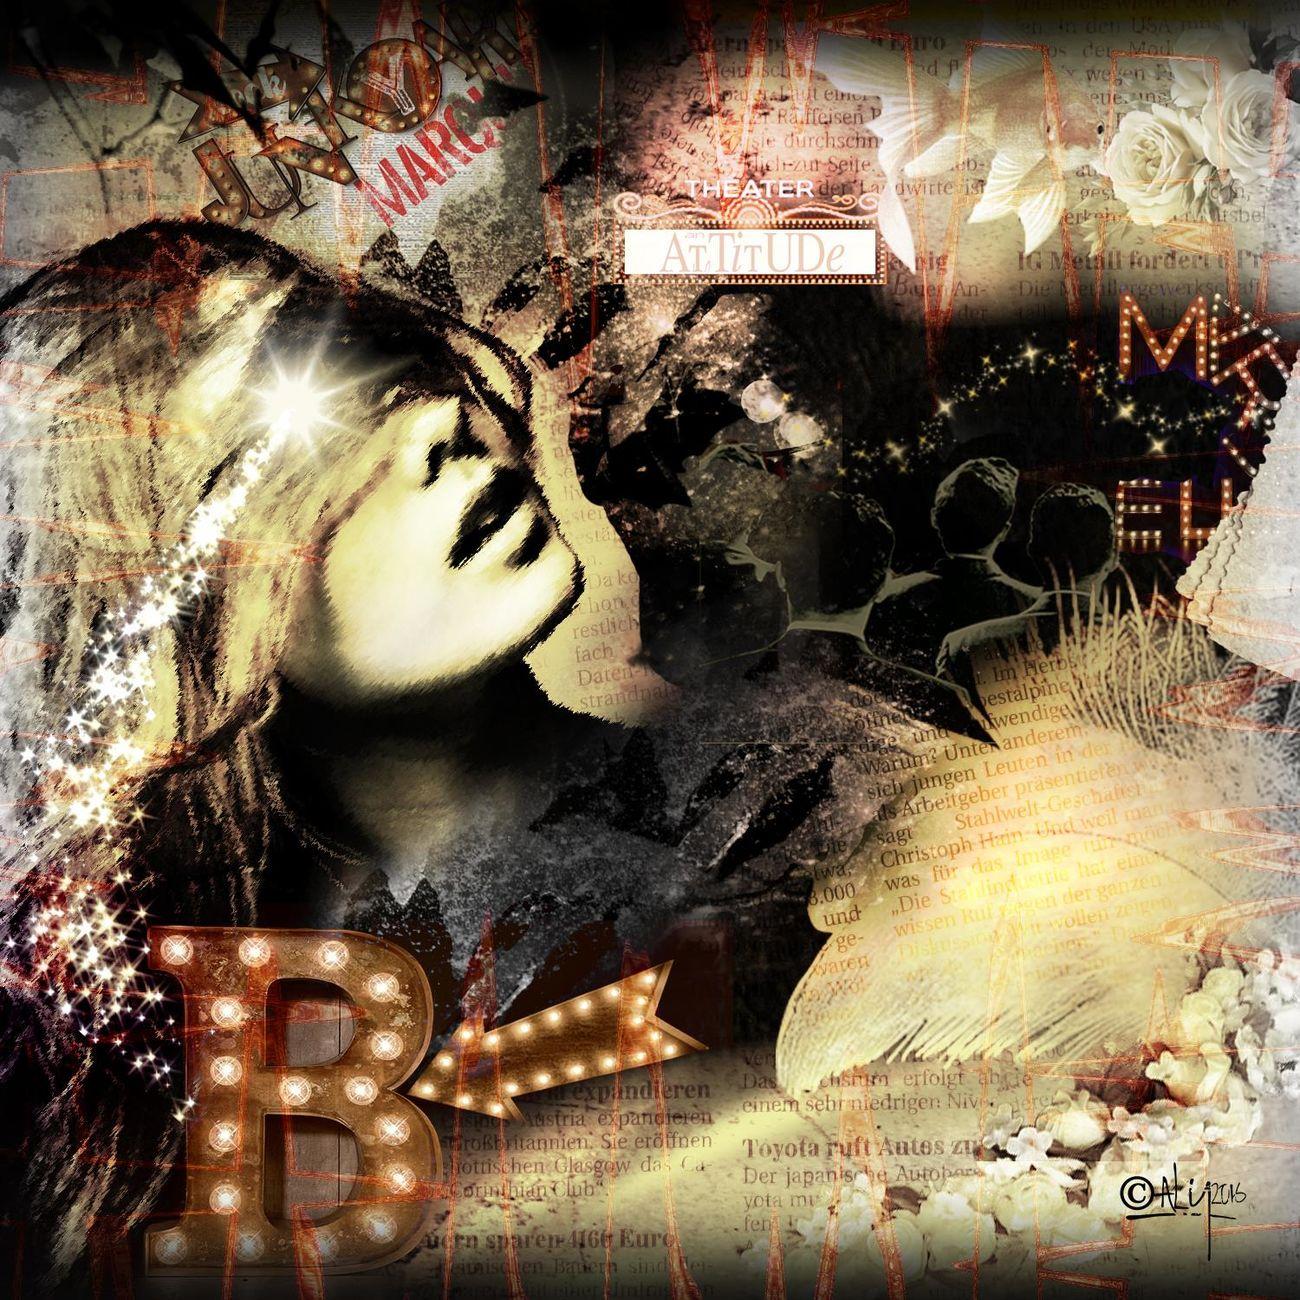 Collage Collage Art Digital Art Dream El Drama De Aly Magaly Avila Photo Montage Sureal Art  Theater Woman Portrait